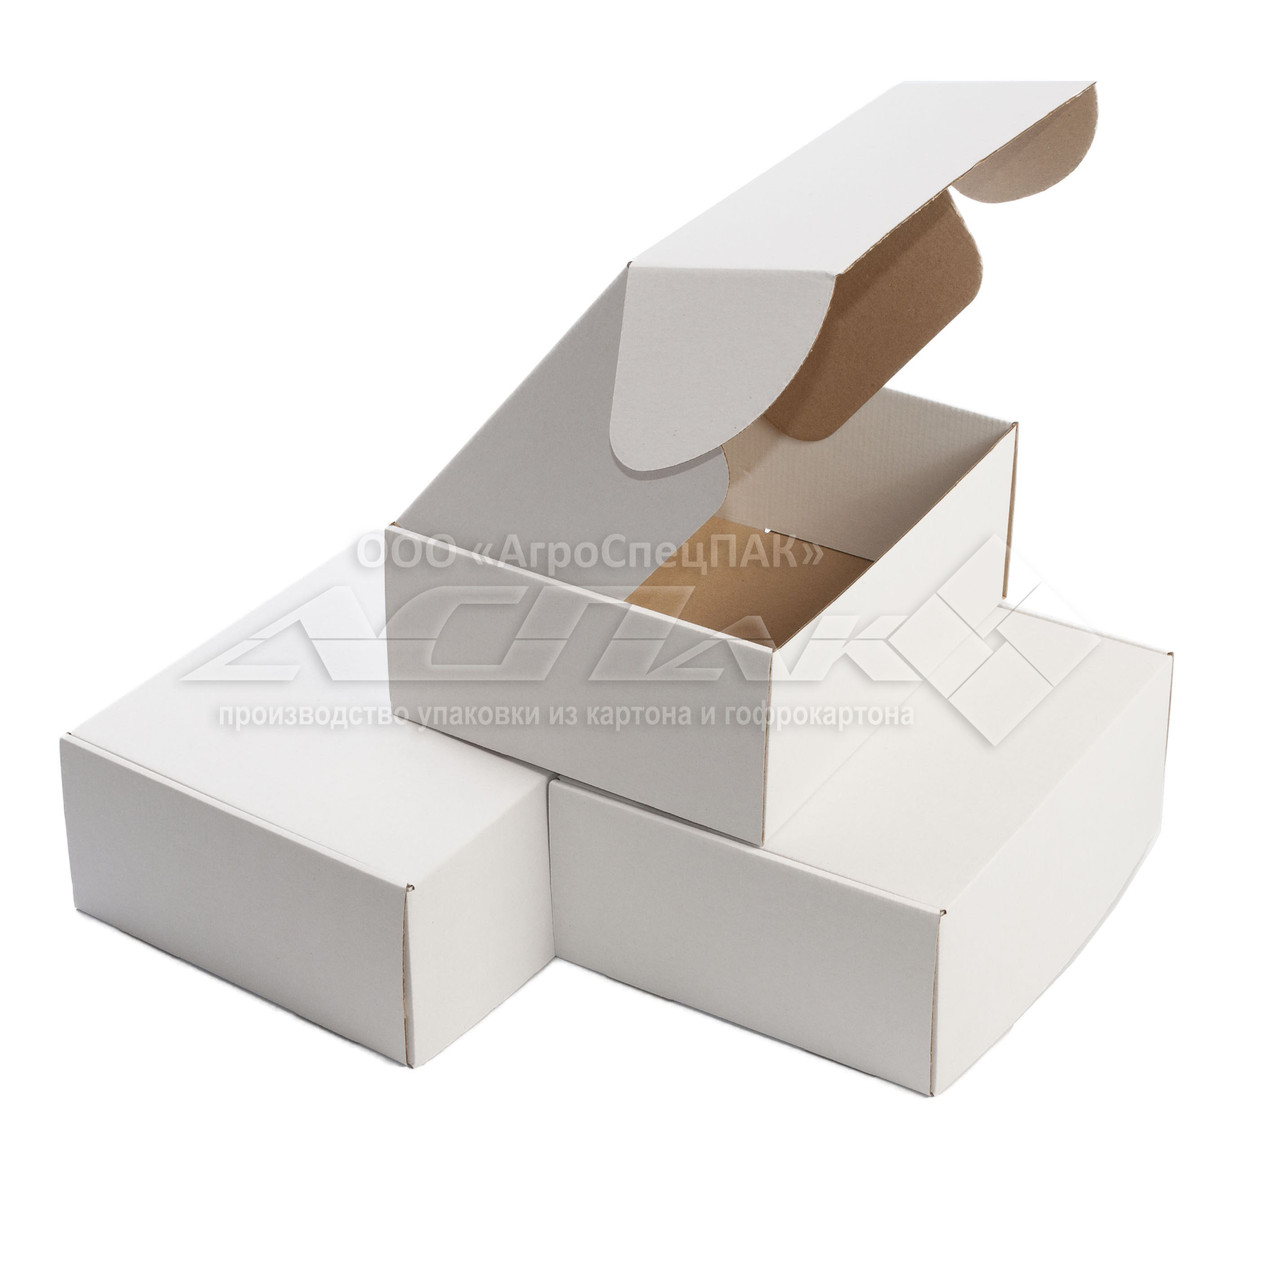 Картонная коробка 270х220х110 белая